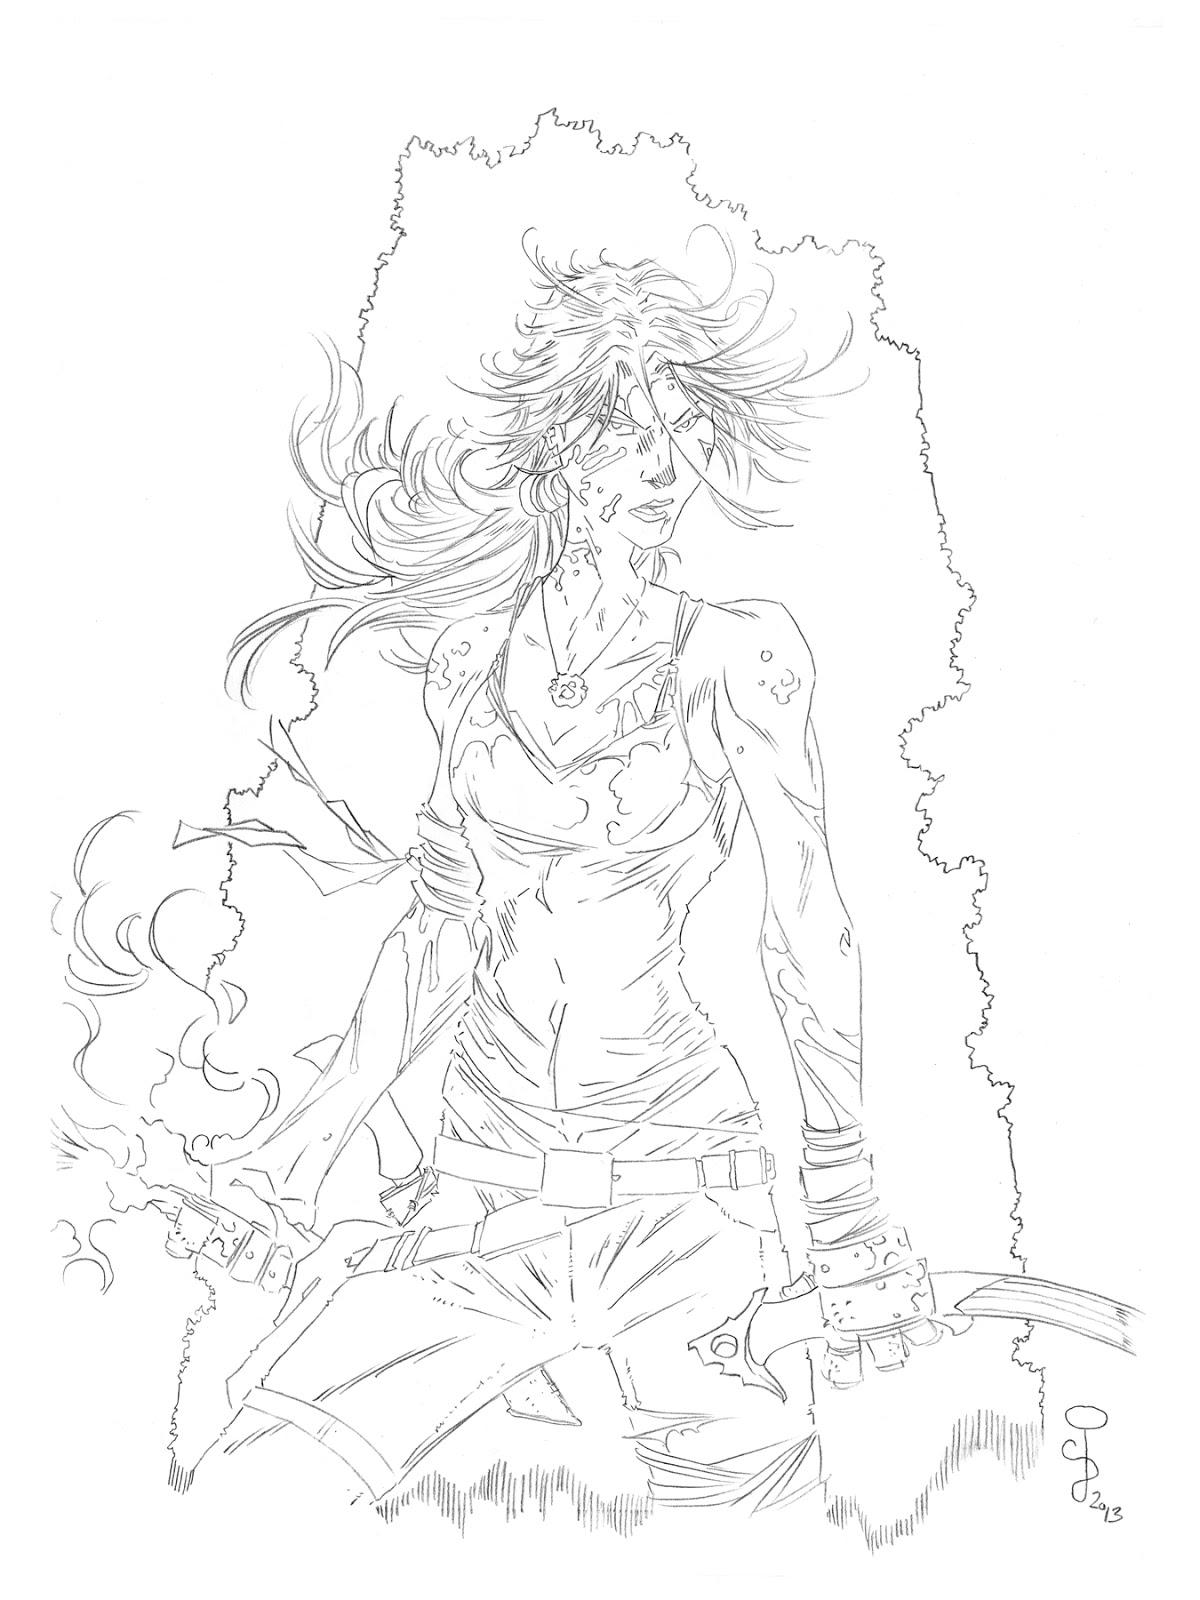 CjB Productions: Tomb Raider Art Process